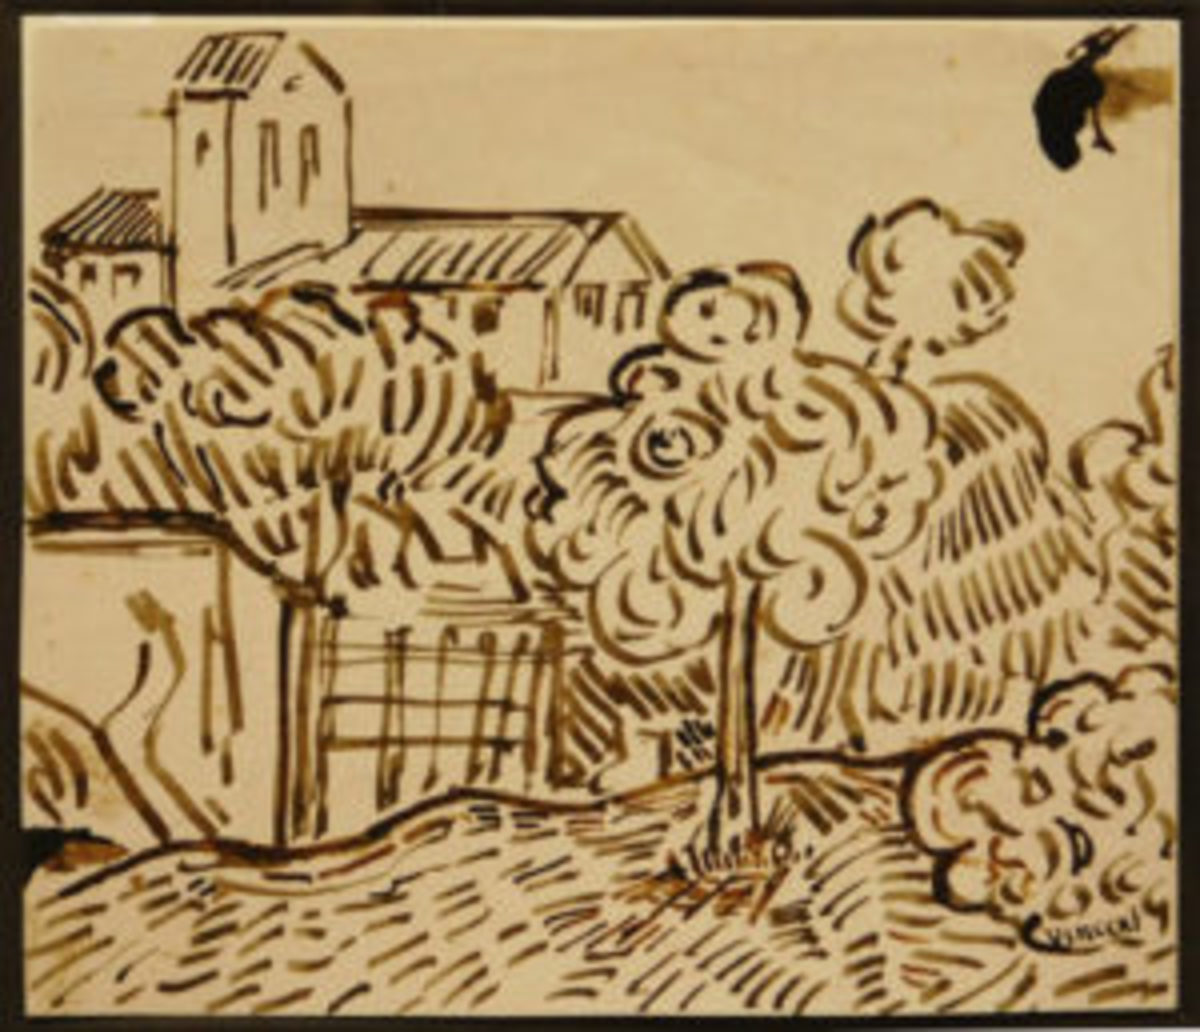 Van Goh drawing